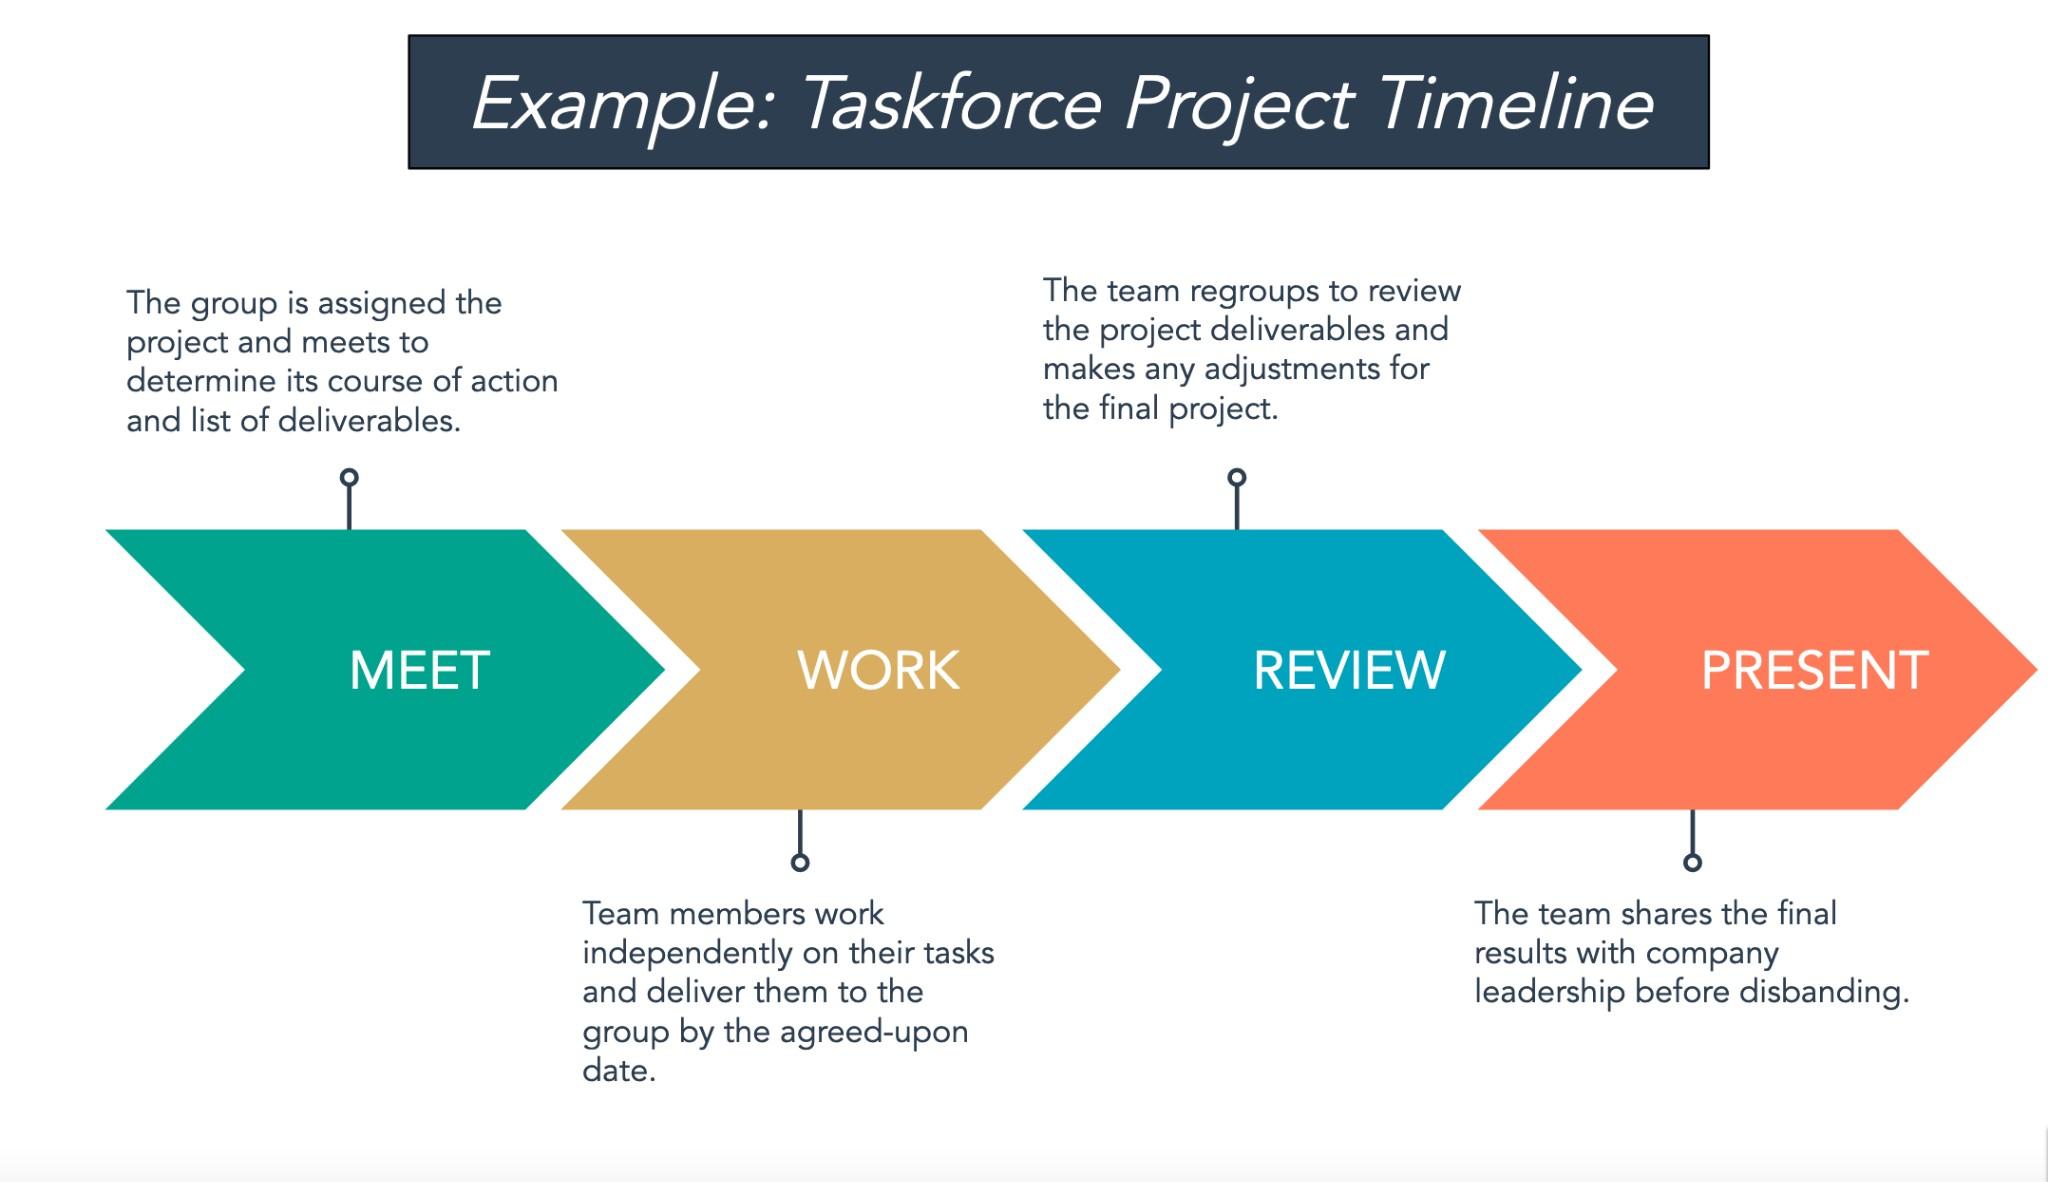 Taskforce Project Timeline Example